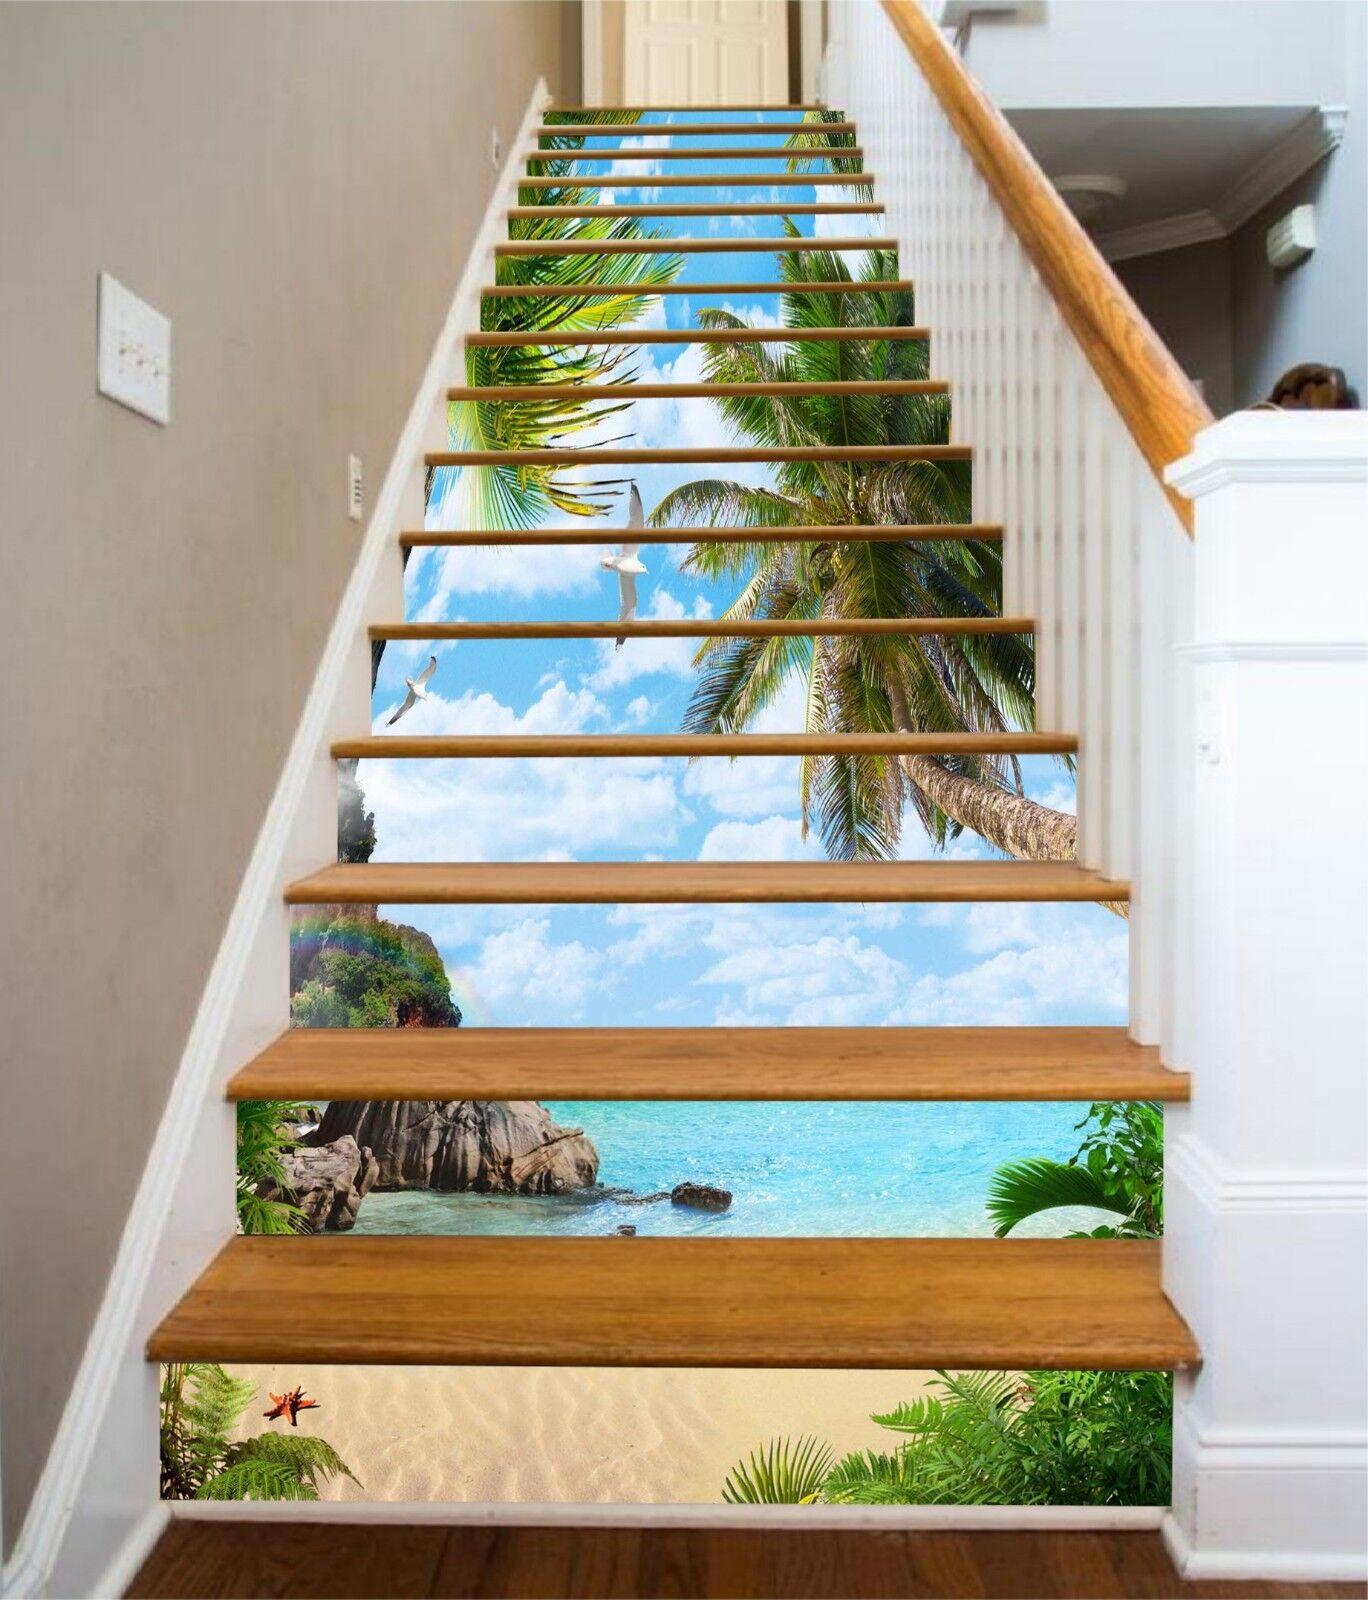 3D Ocean Palm Tree Stair Risers Decoration Photo Mural Vinyl Decal Wallpaper UK